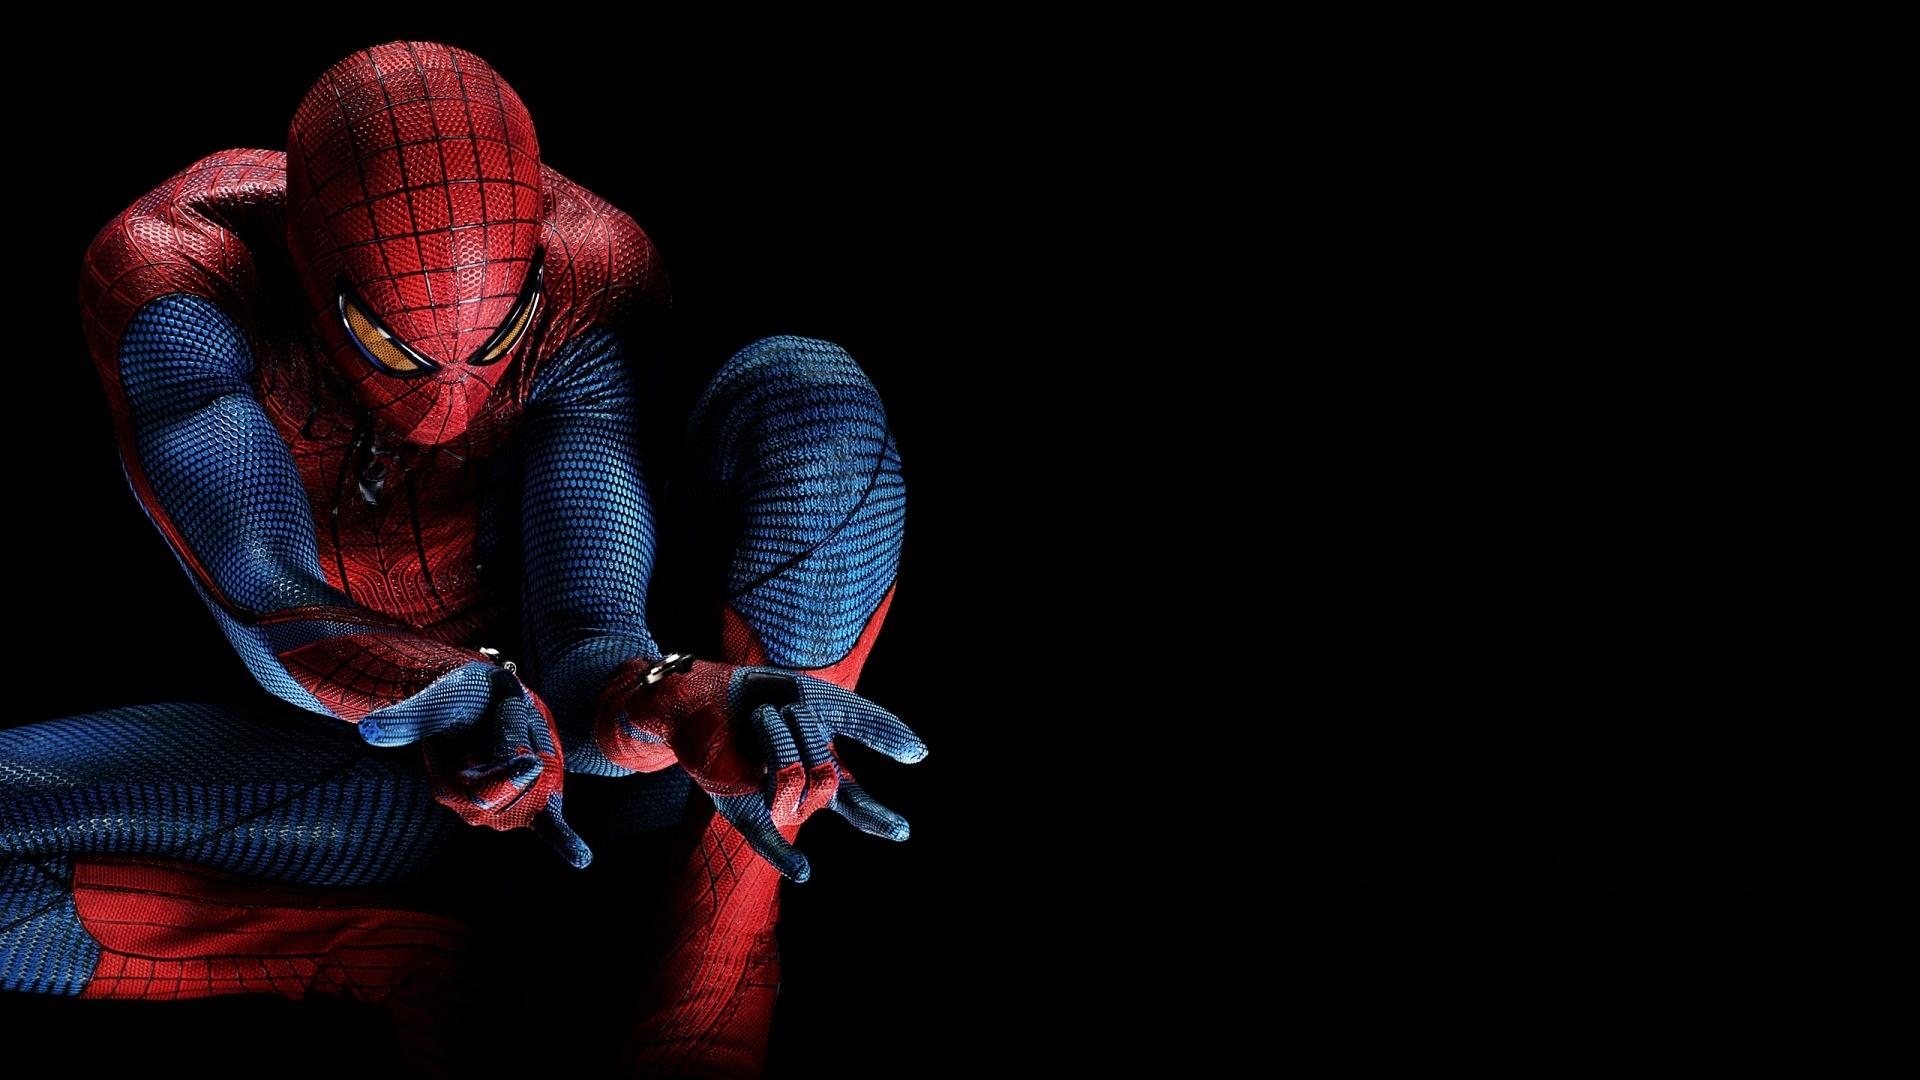 Best Movie Spiderman Homecoming Wallpaper Hd Spiderman